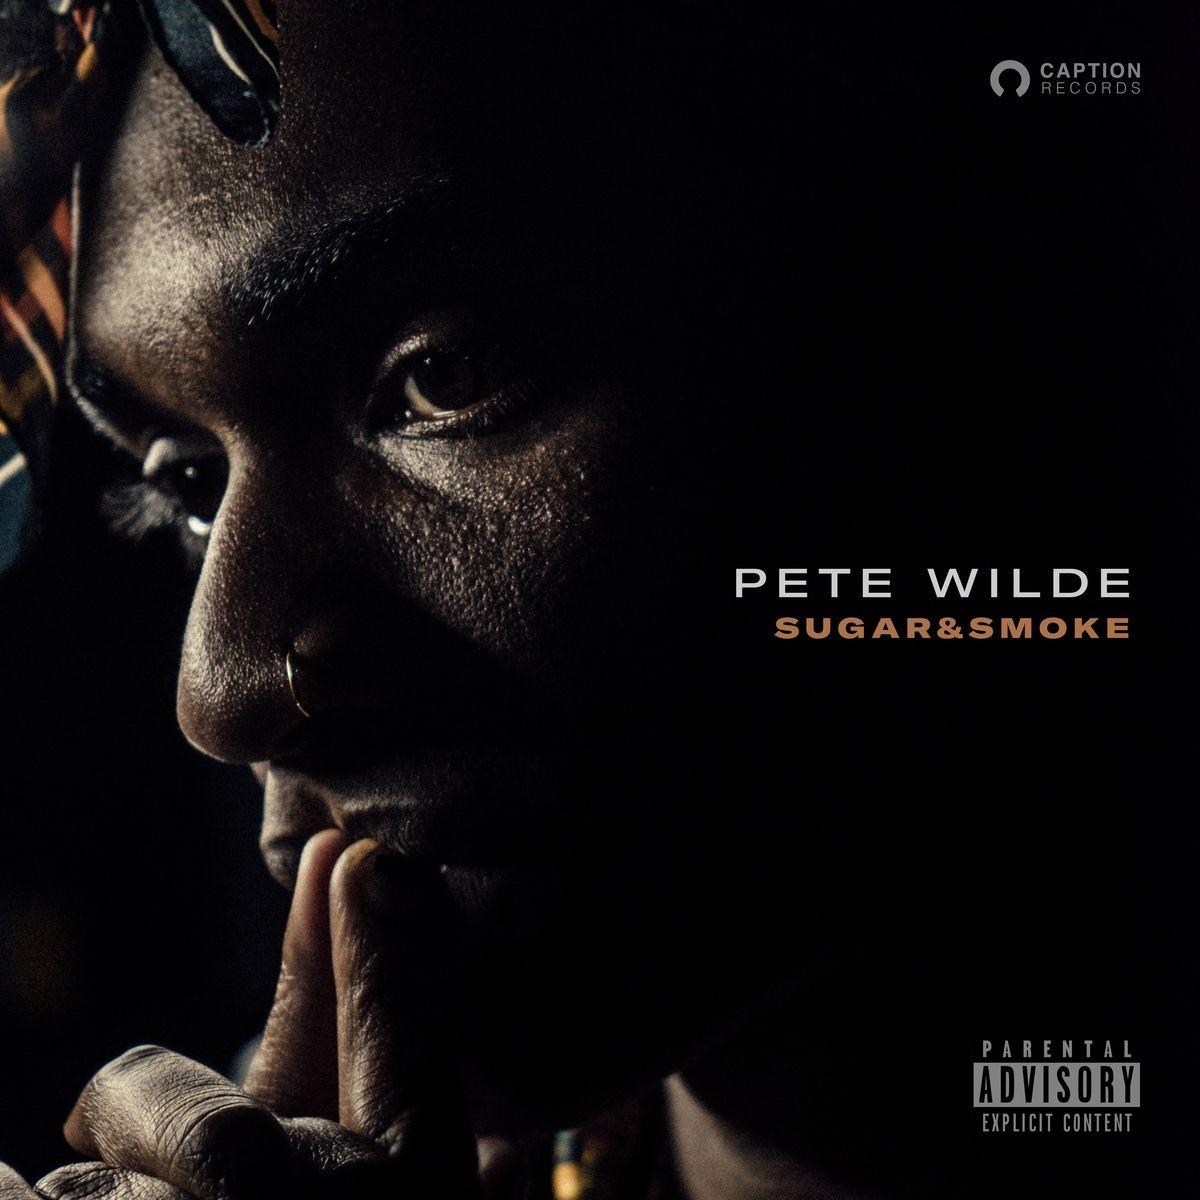 Pete-Wilde-Sugar-and-Smoke